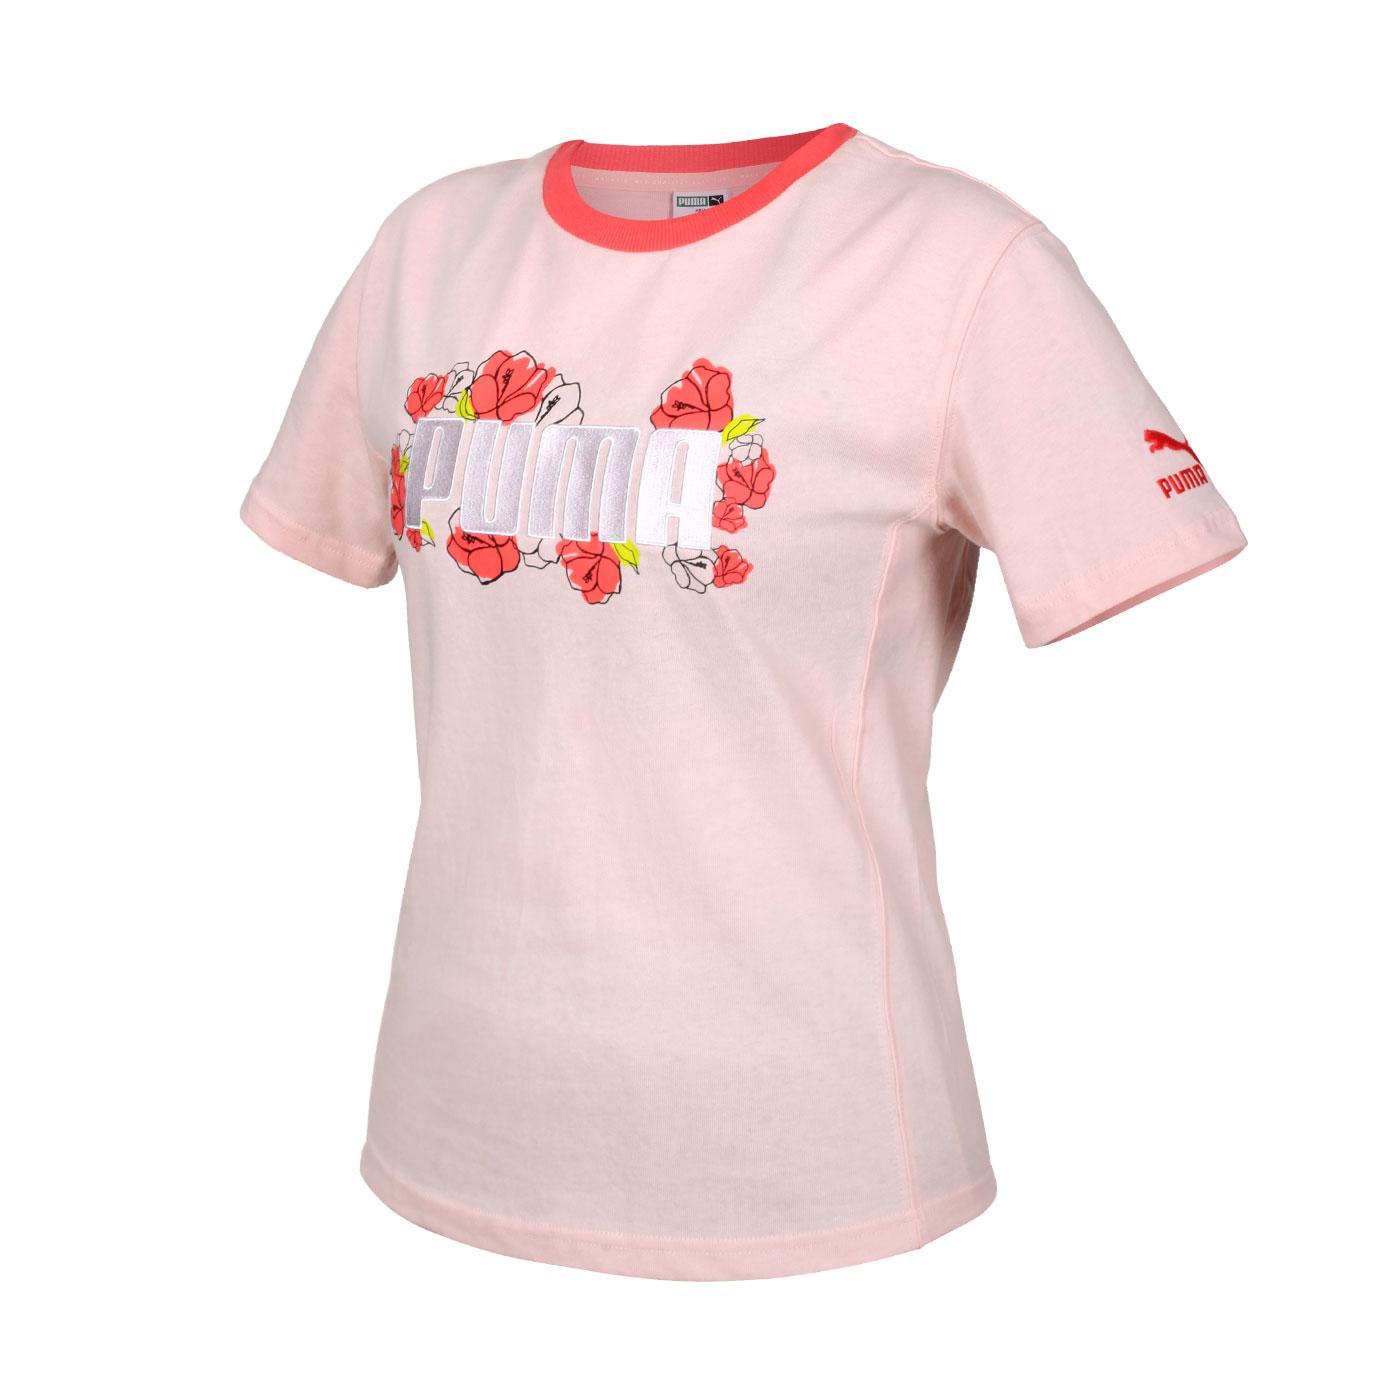 PUMA 女款Floral短袖T恤 53204227